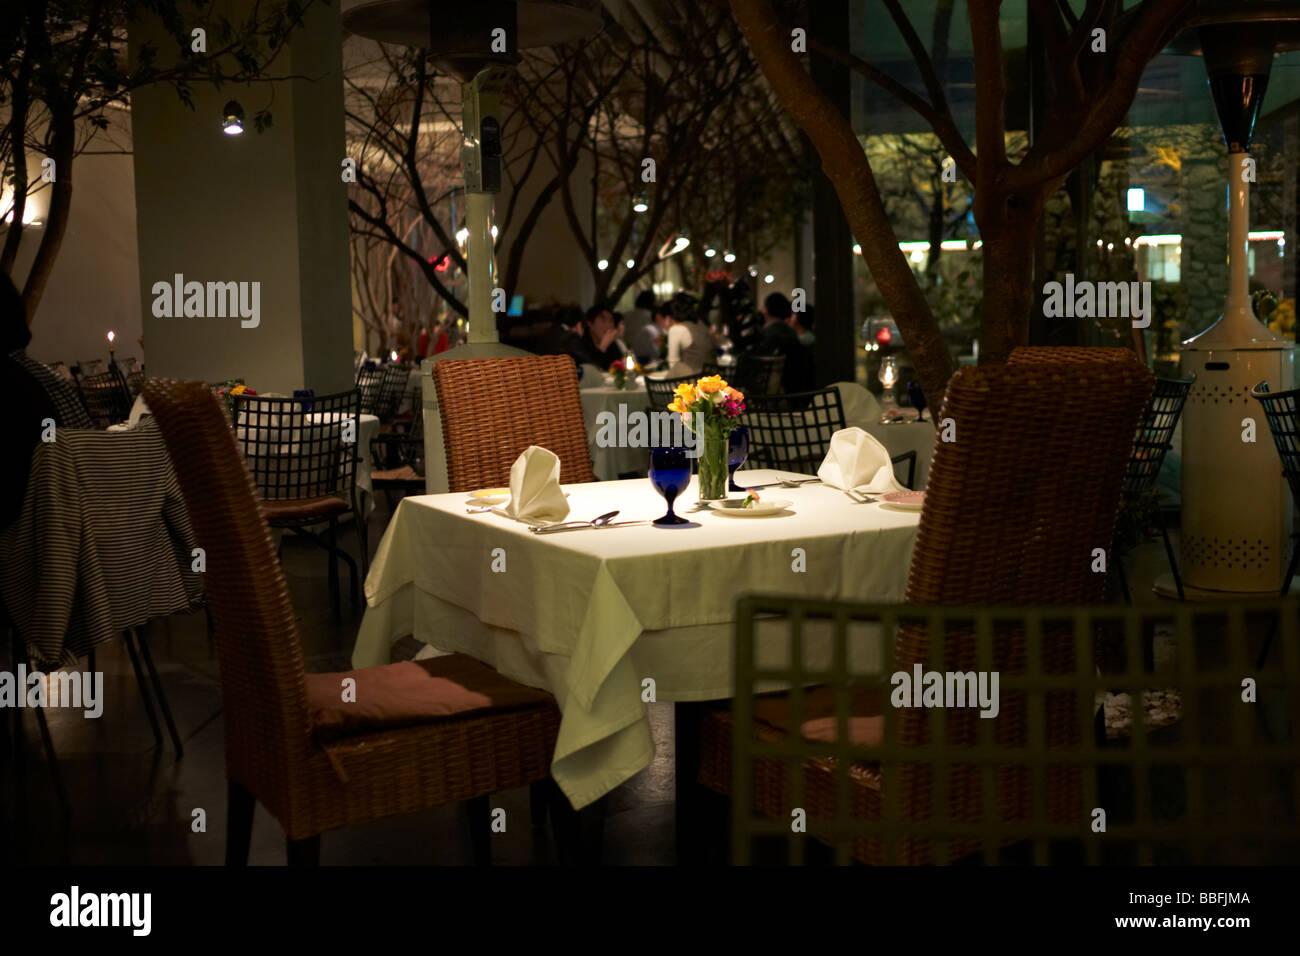 Cozy Italian restaurant in Seocho distric Seoul, South Korea - Stock Image